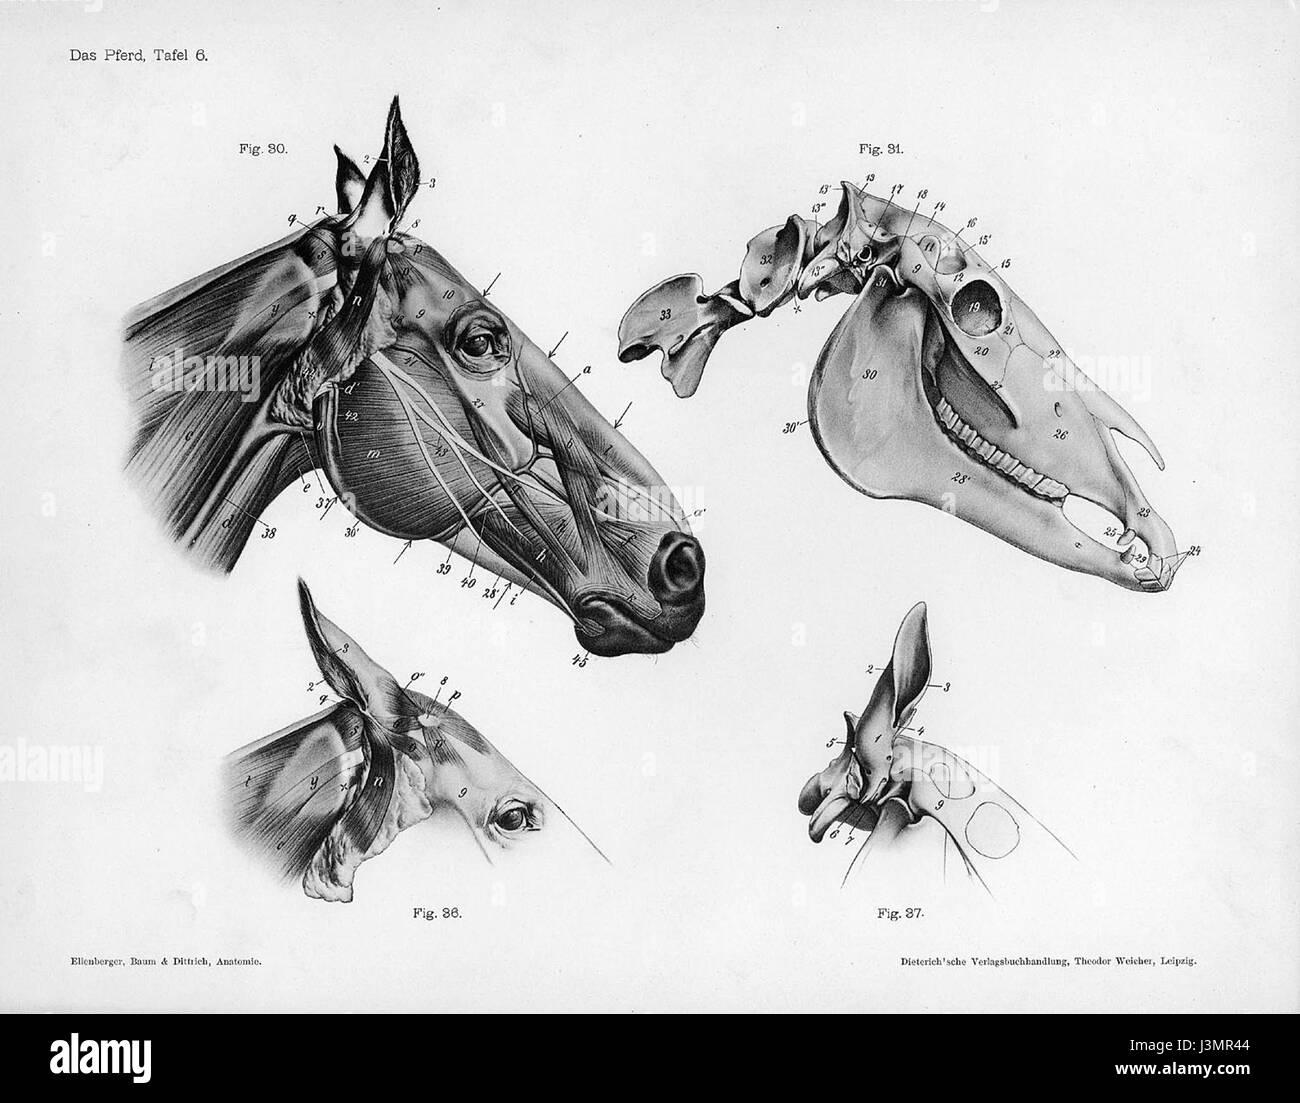 Horse Anatomy Illustration Stockfotos & Horse Anatomy Illustration ...